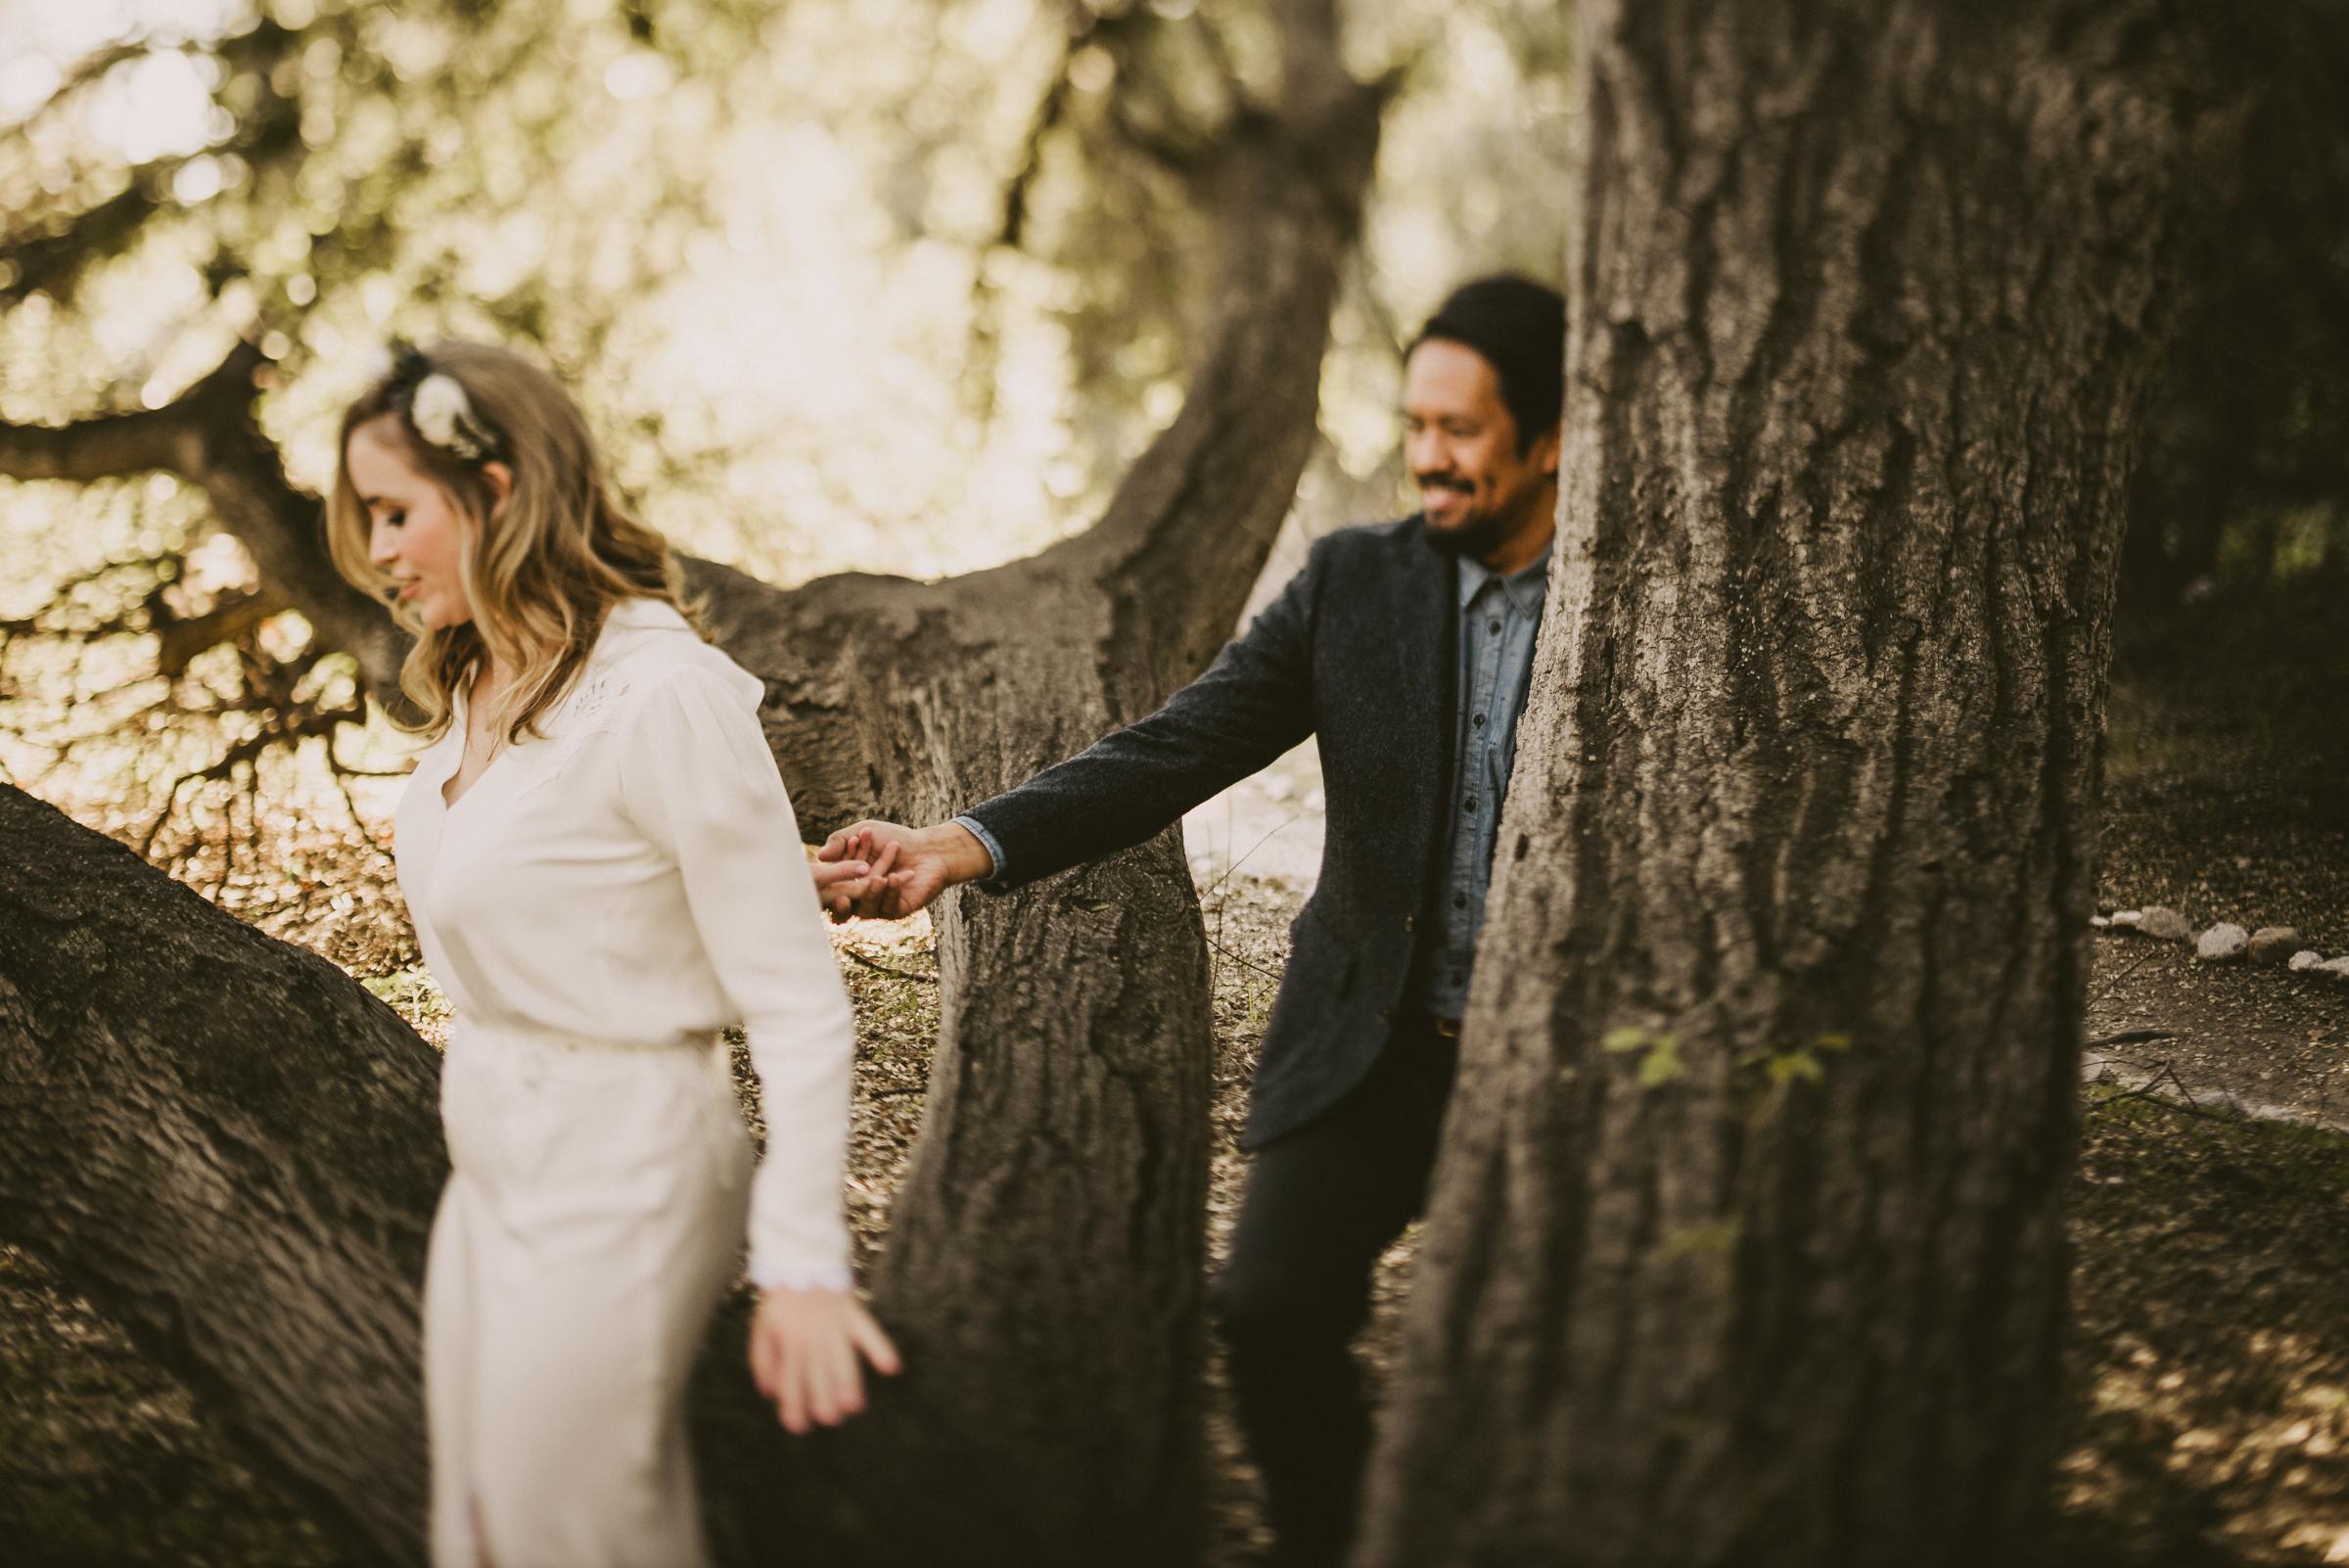 ©Isaiah + Taylor Photography - Intimate Elopement, Eaton Canyon, Los Angeles Wedding Photographer-22.jpg